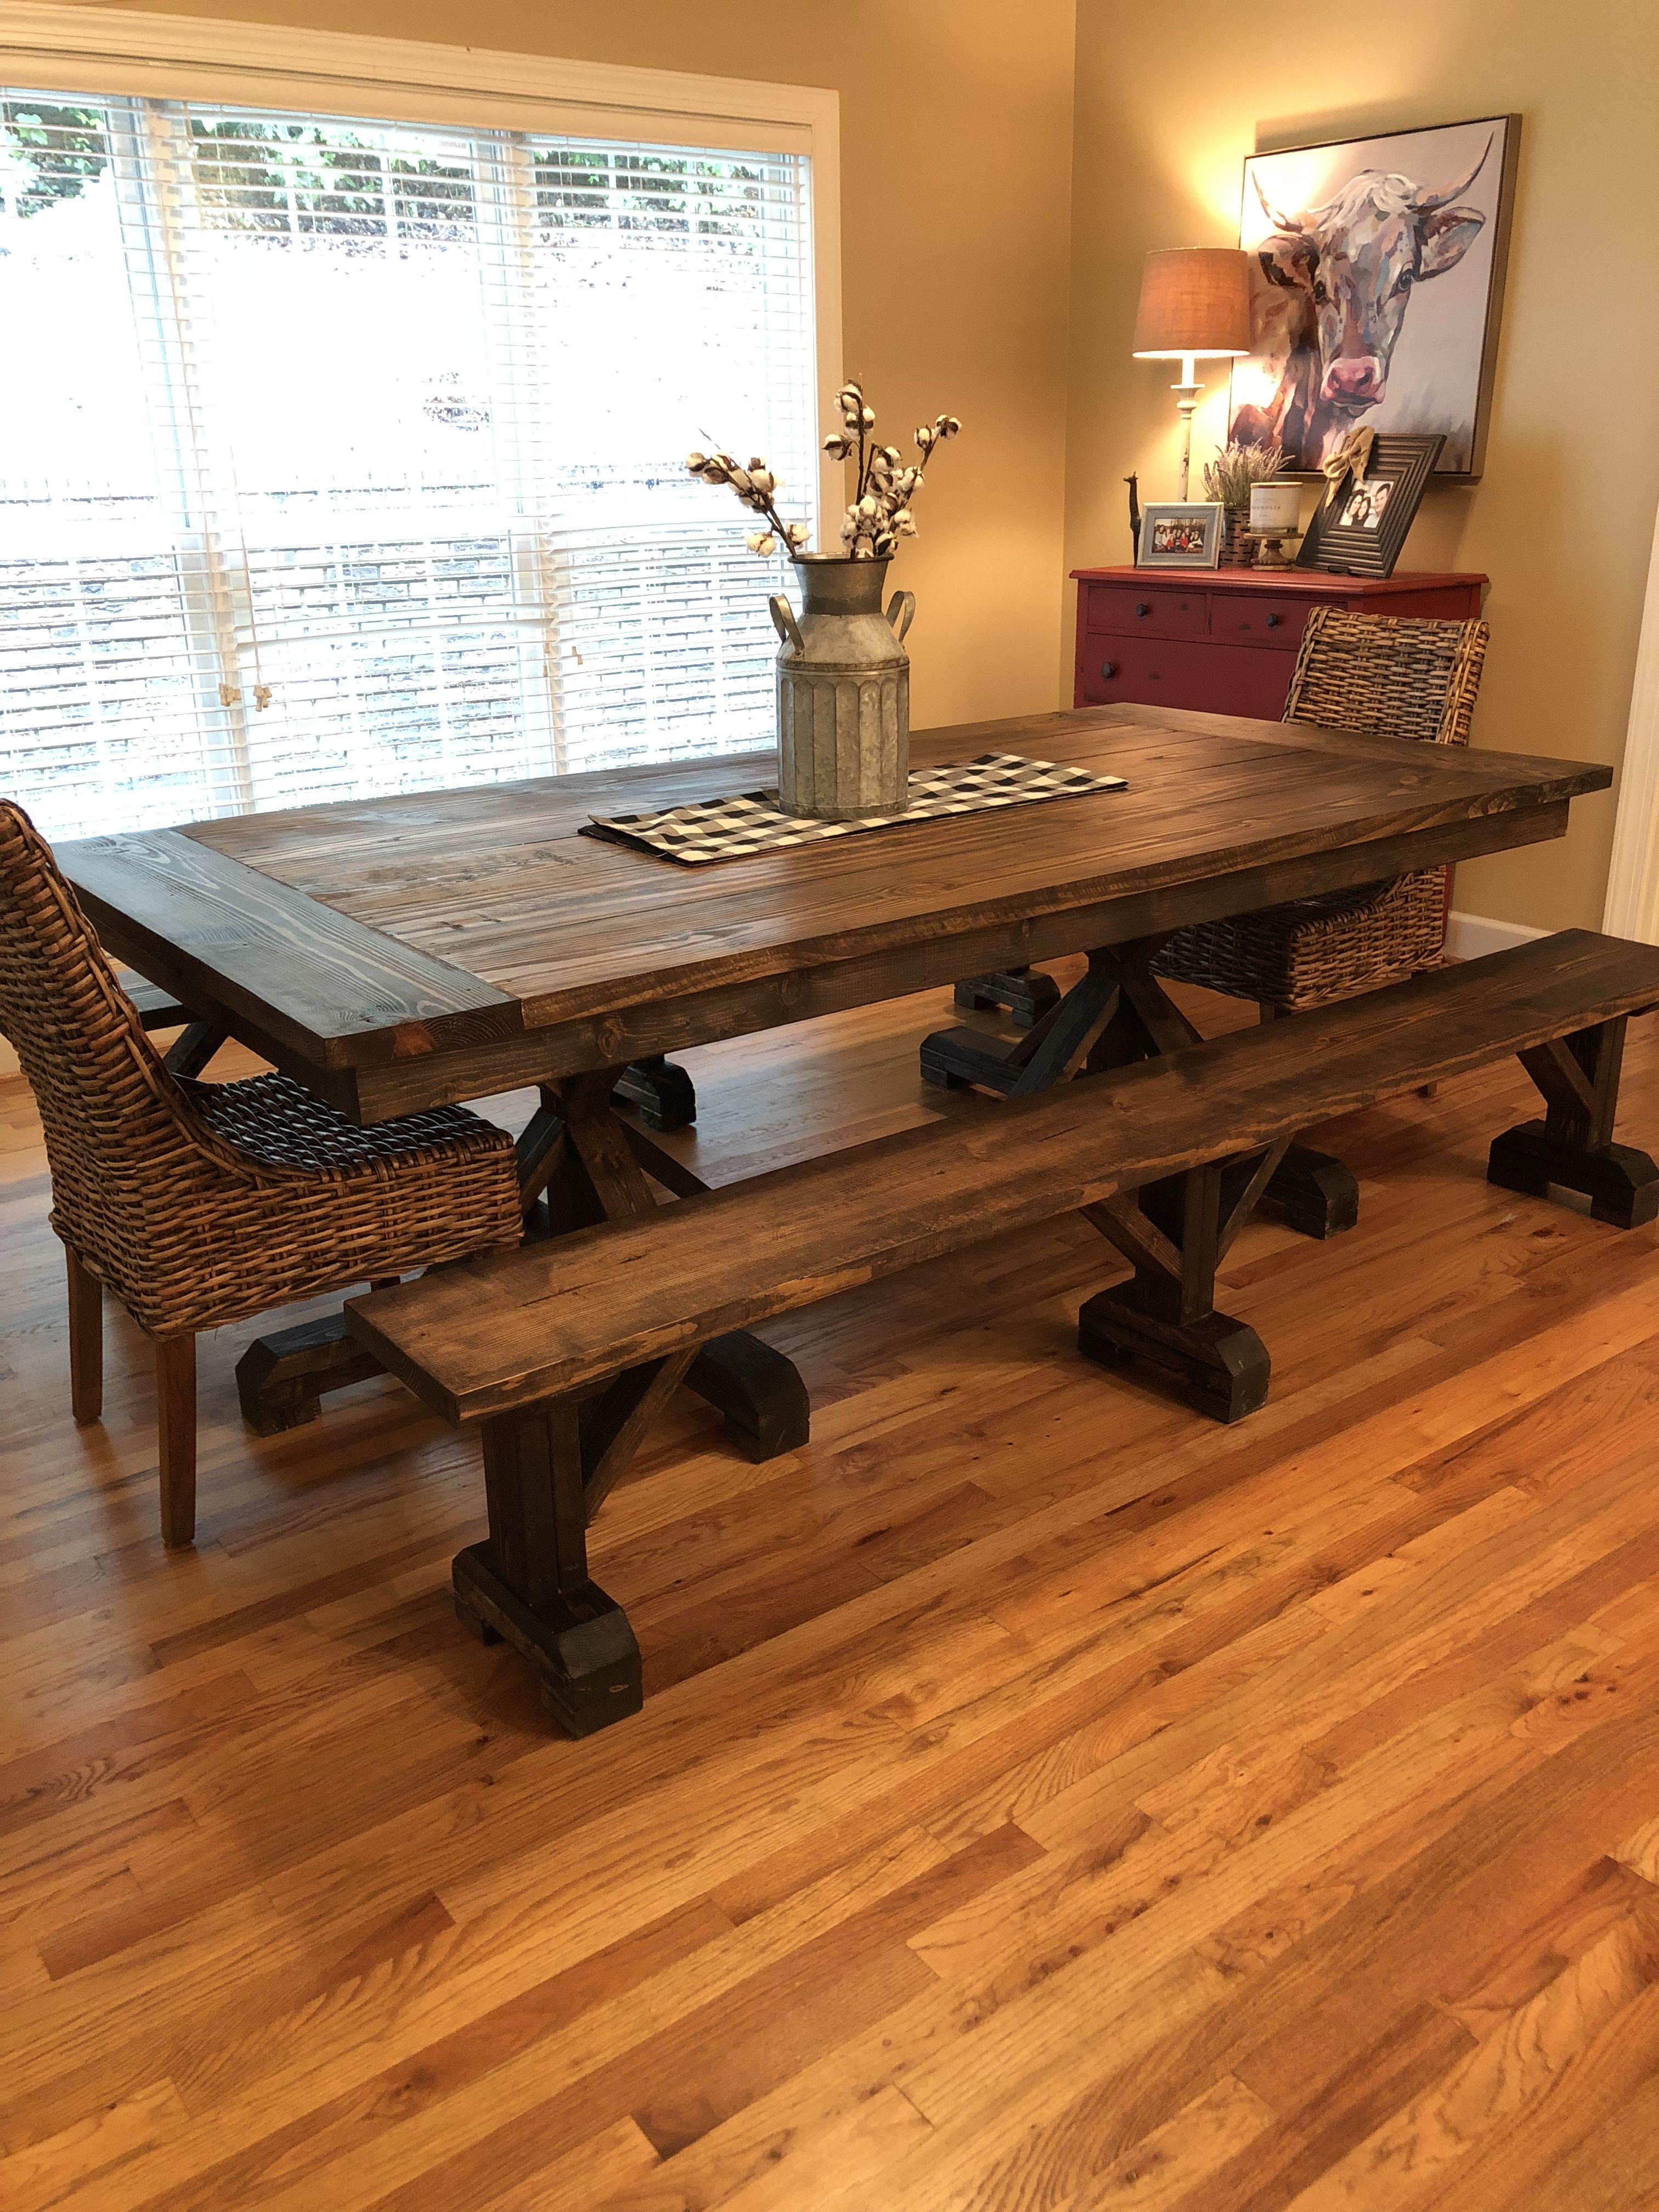 Edgewater Designs Home Facebook Farmhouse dining